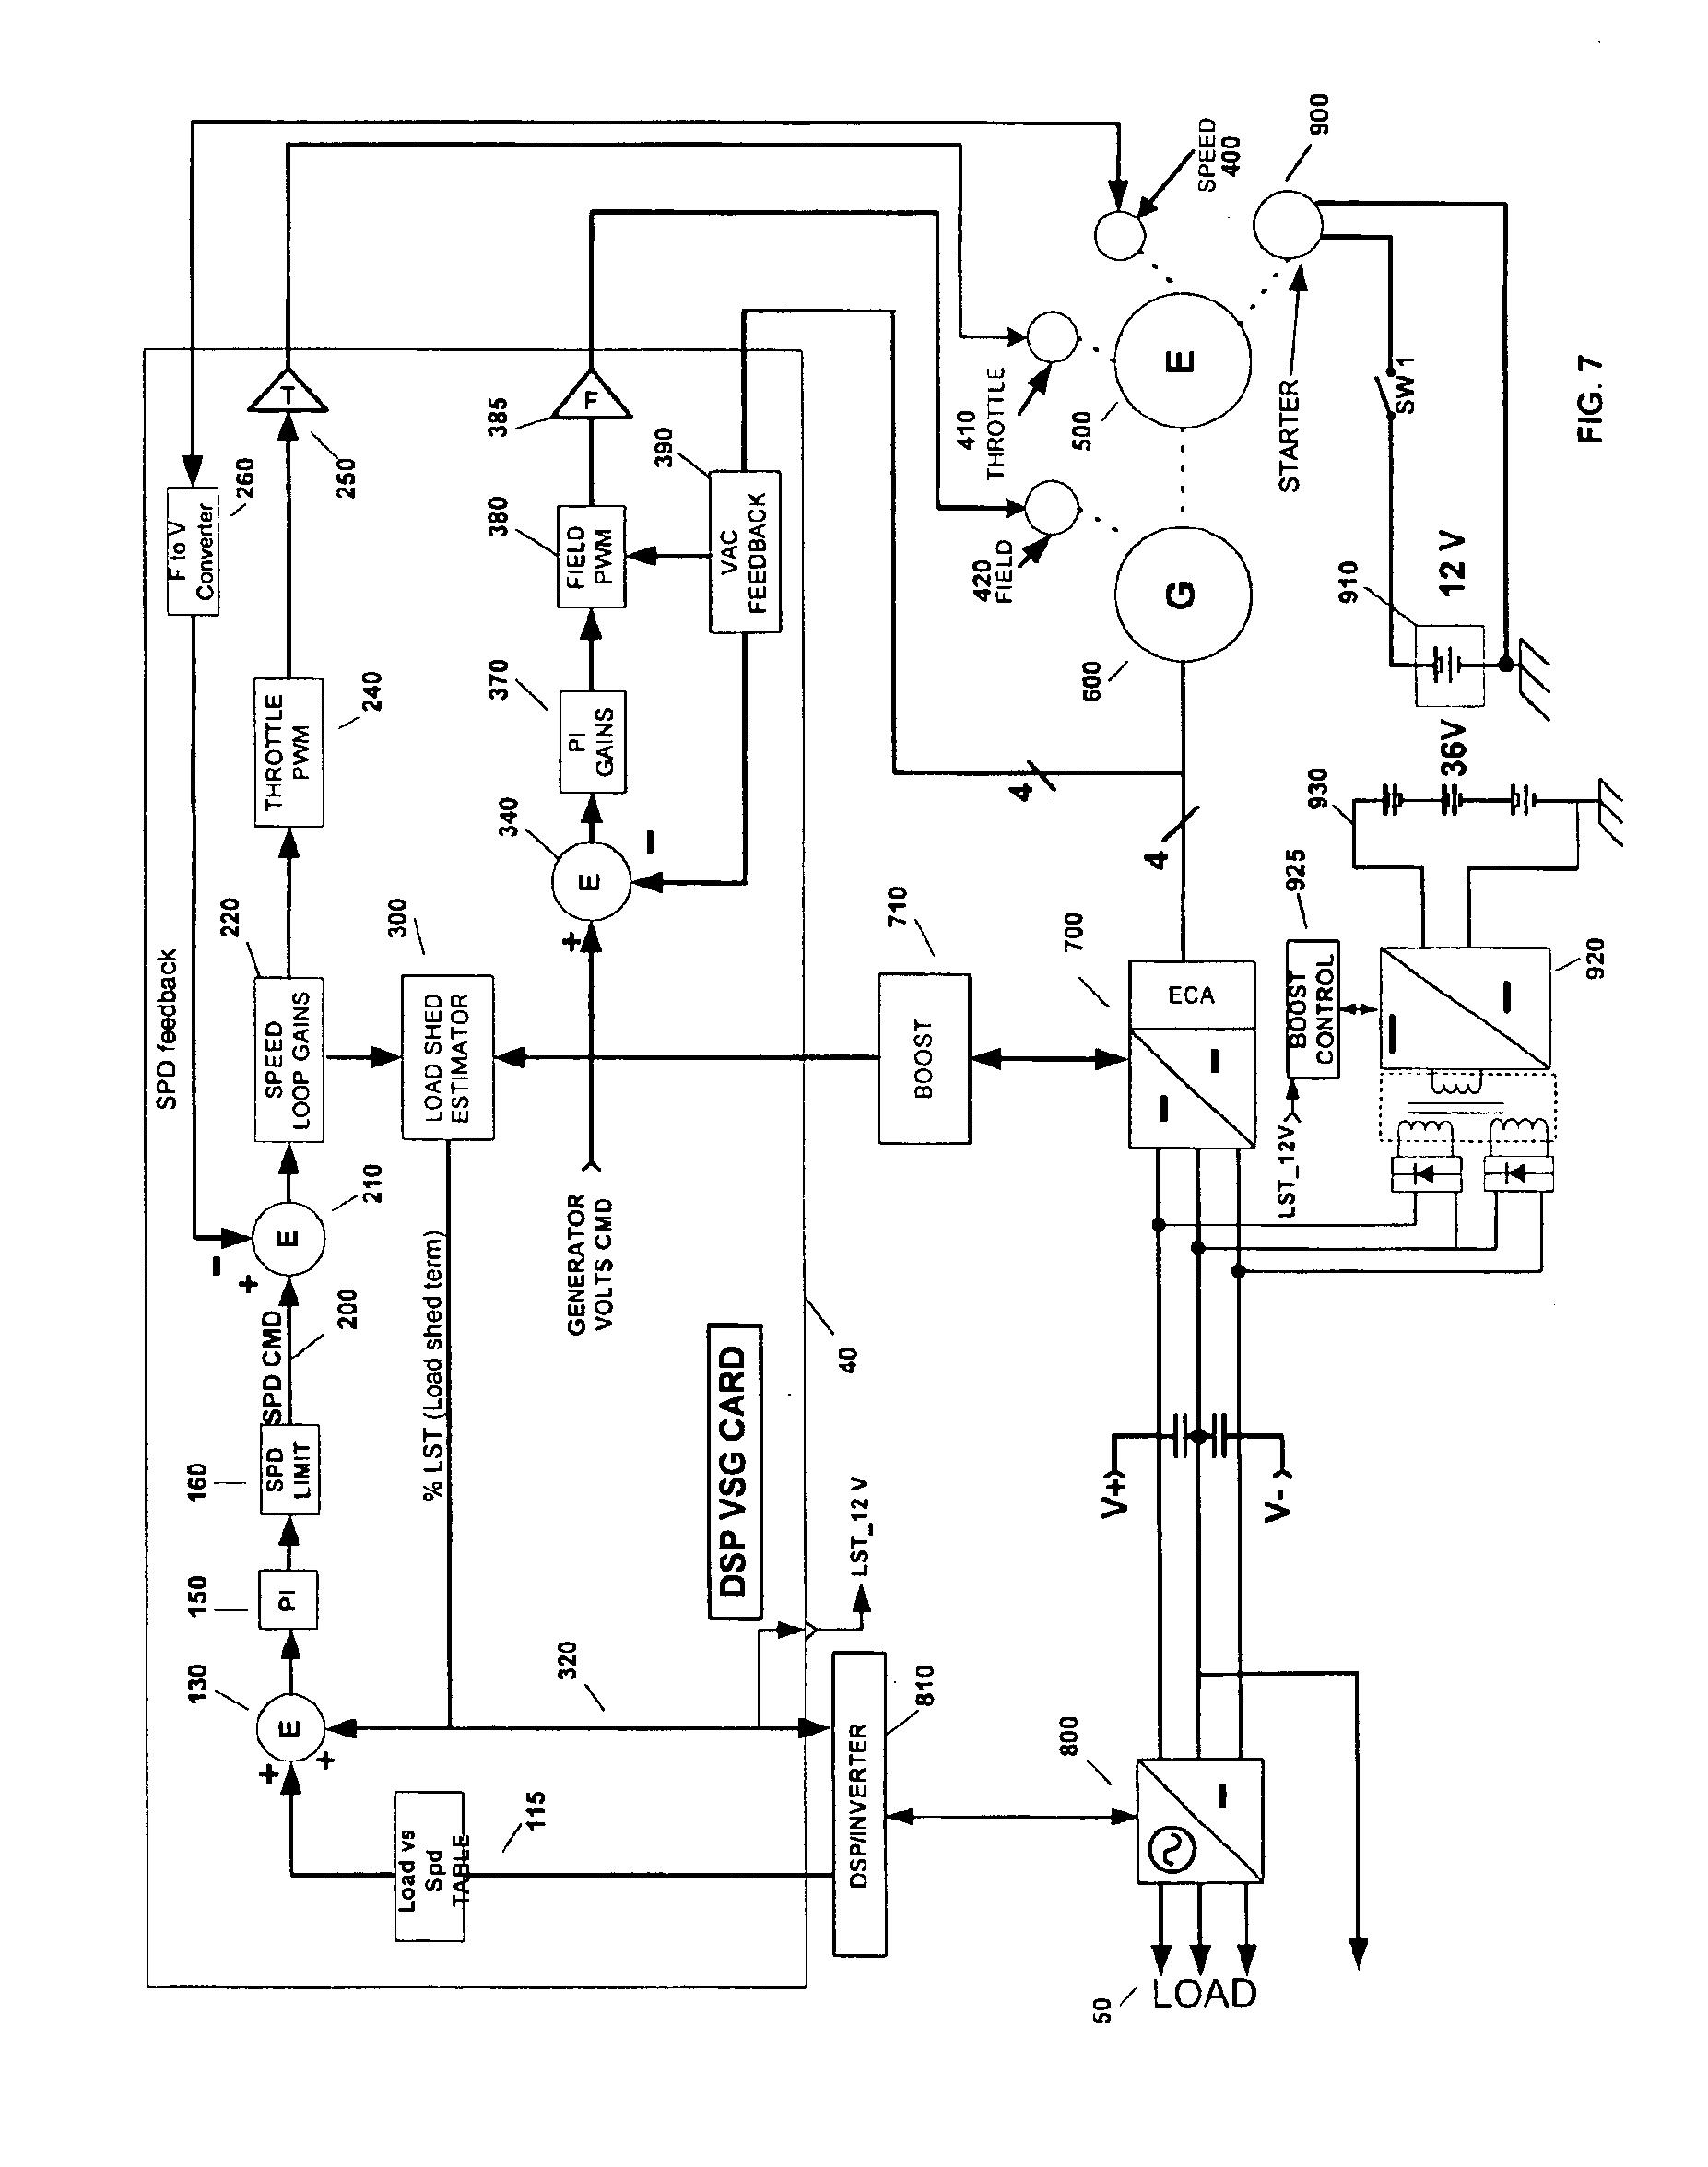 US06879053 20050412 D00007?resize\\\=665%2C844 12 hp kohler wiring diagram wiring diagrams Kohler Engine Diagram 12 5 Command at aneh.co